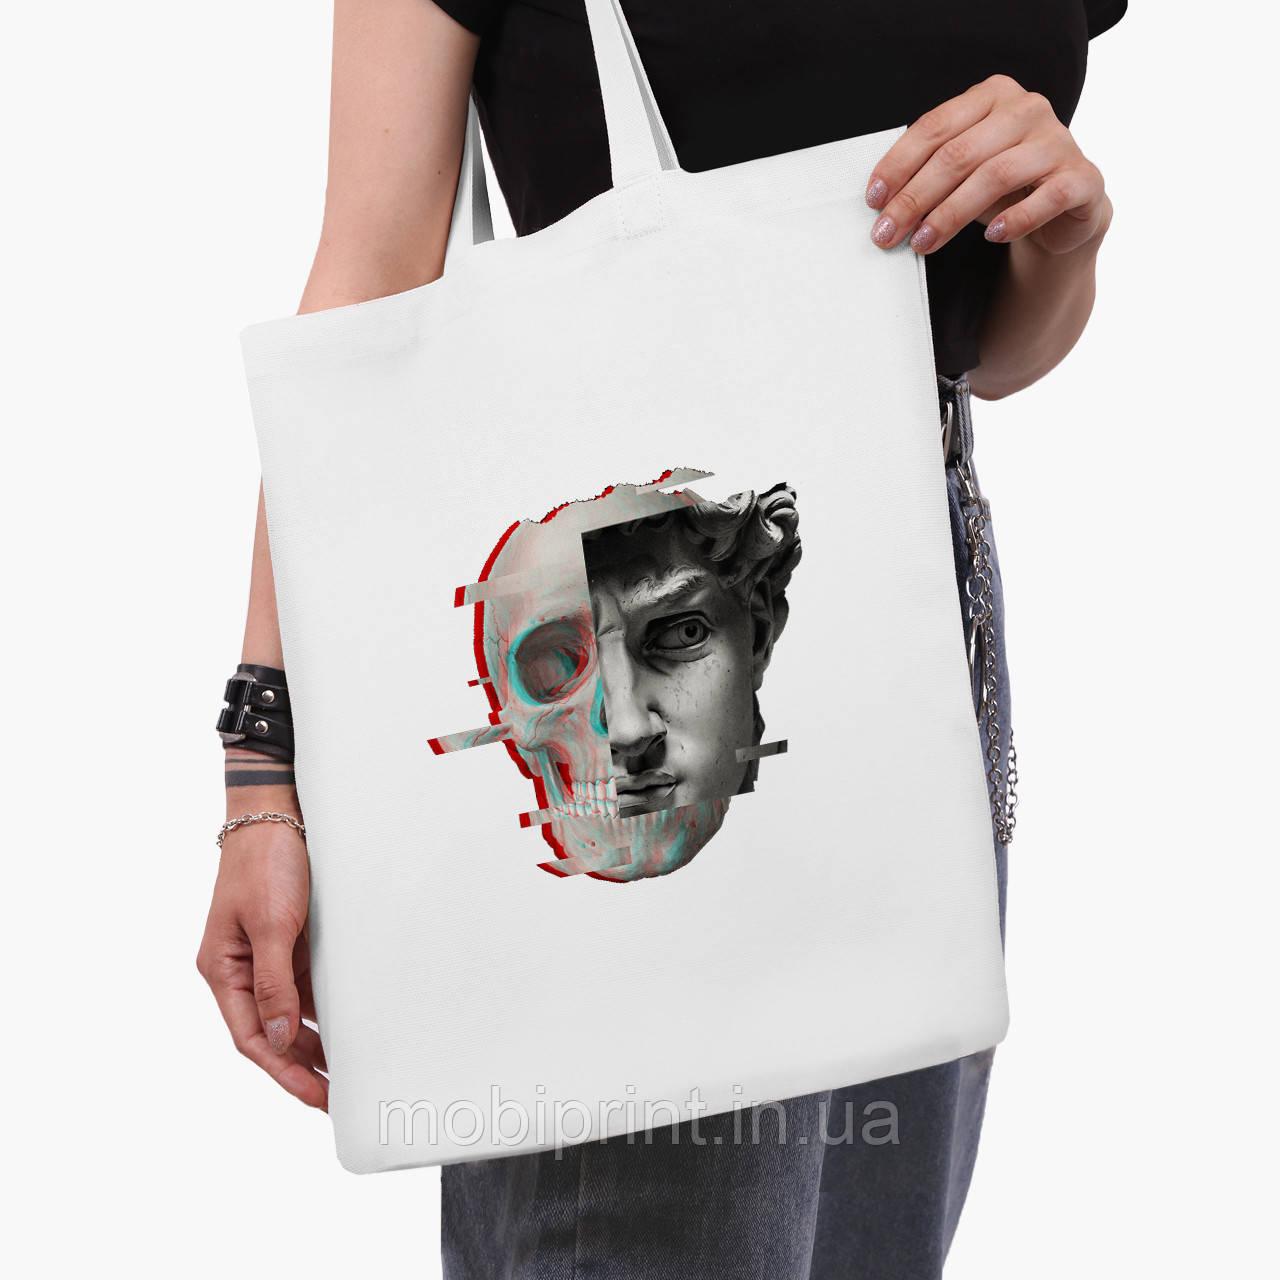 Еко сумка шоппер біла Ренесанс-Давид (David Renaissance) (9227-1585-3) 41*35 см